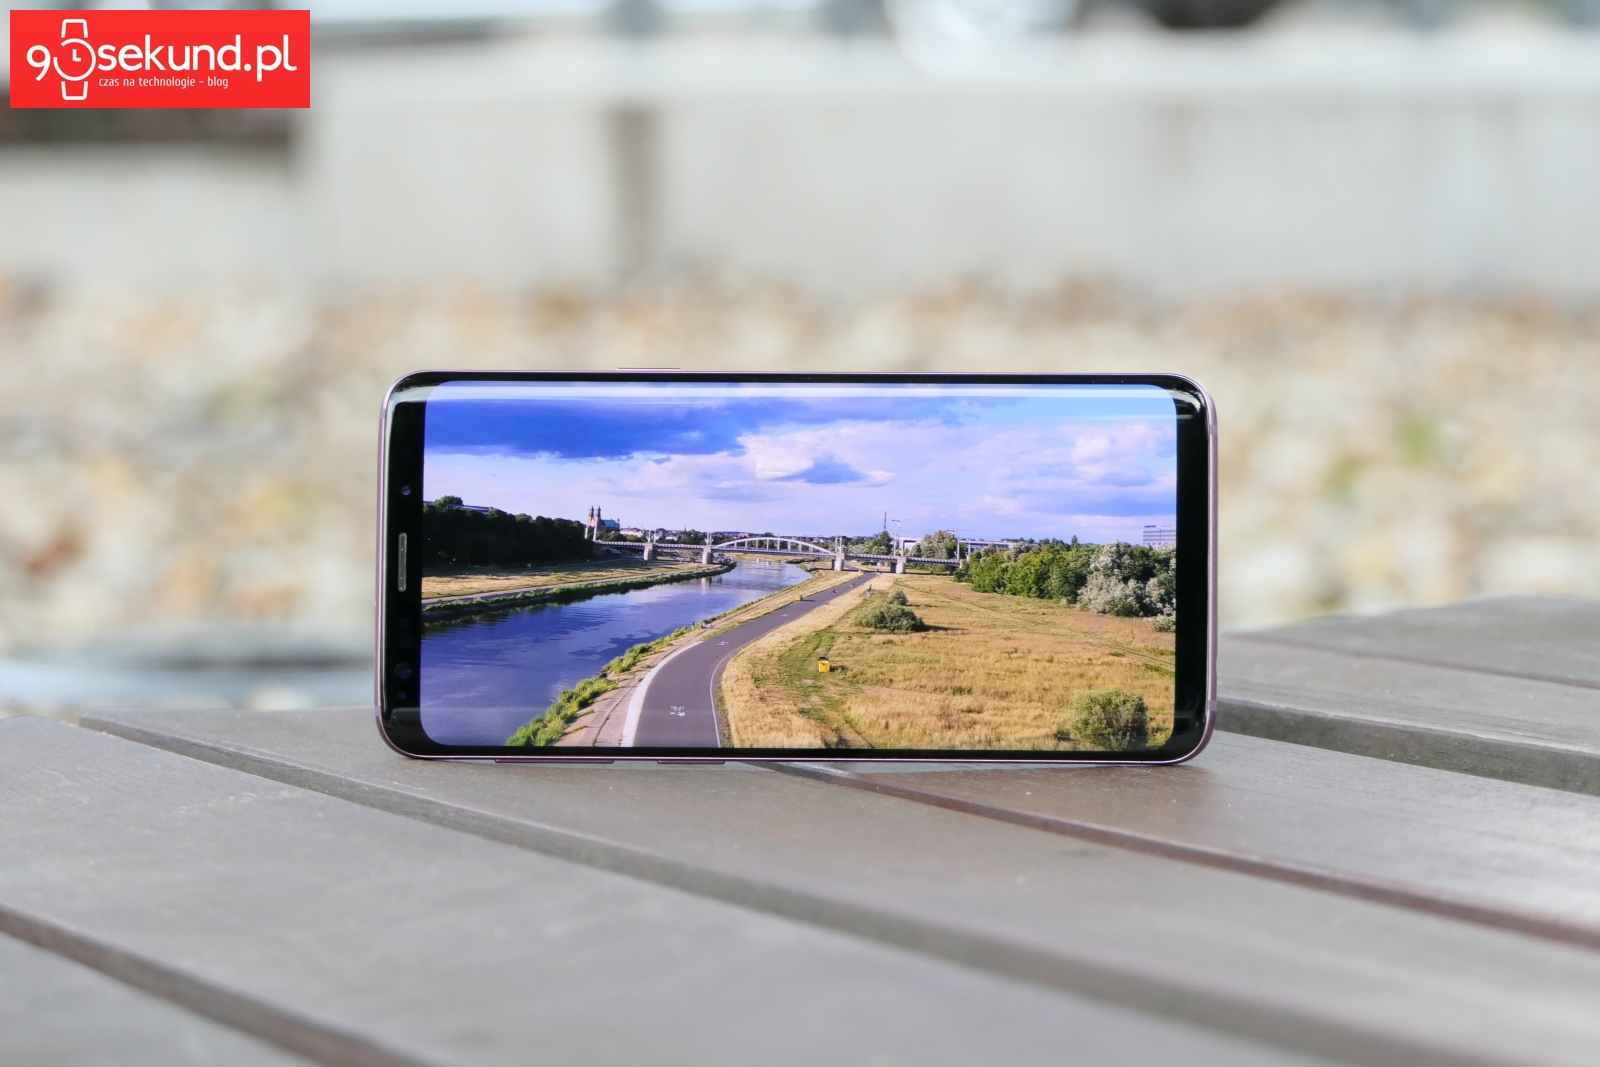 Recenzja Samsung Galaxy S9 (SM-G960F) - 90sekund.pl - Michał Brożyński